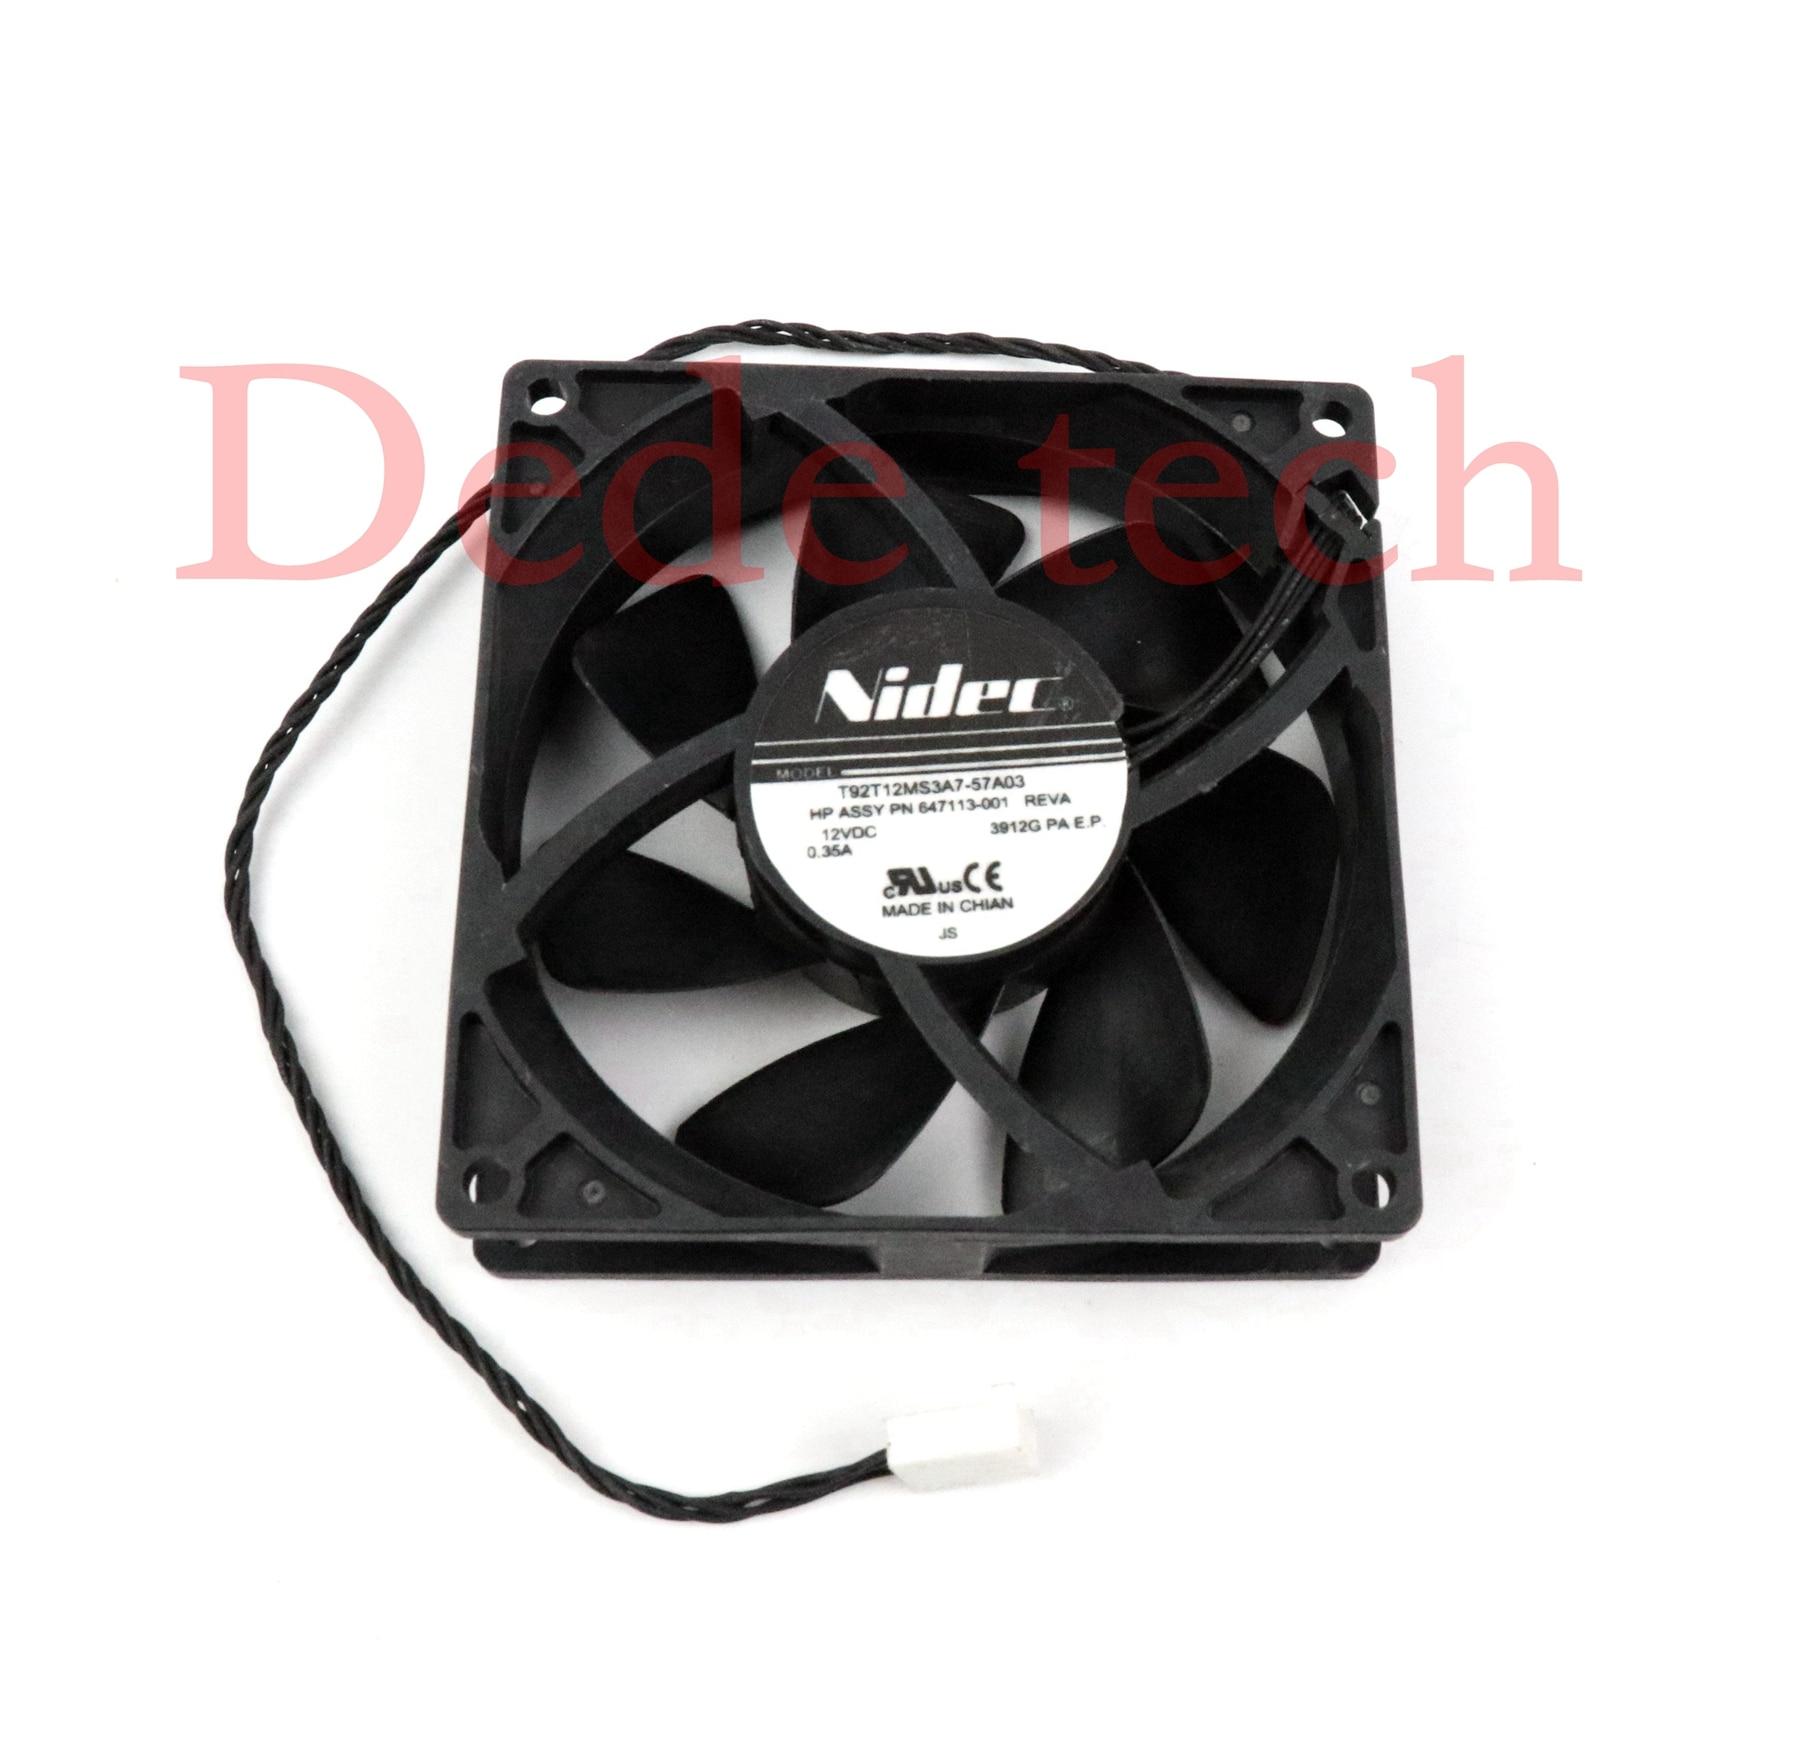 CPU Cooling Fan 647113-001 749598-001 782506-001 For HP Z840 Z820 US Seller